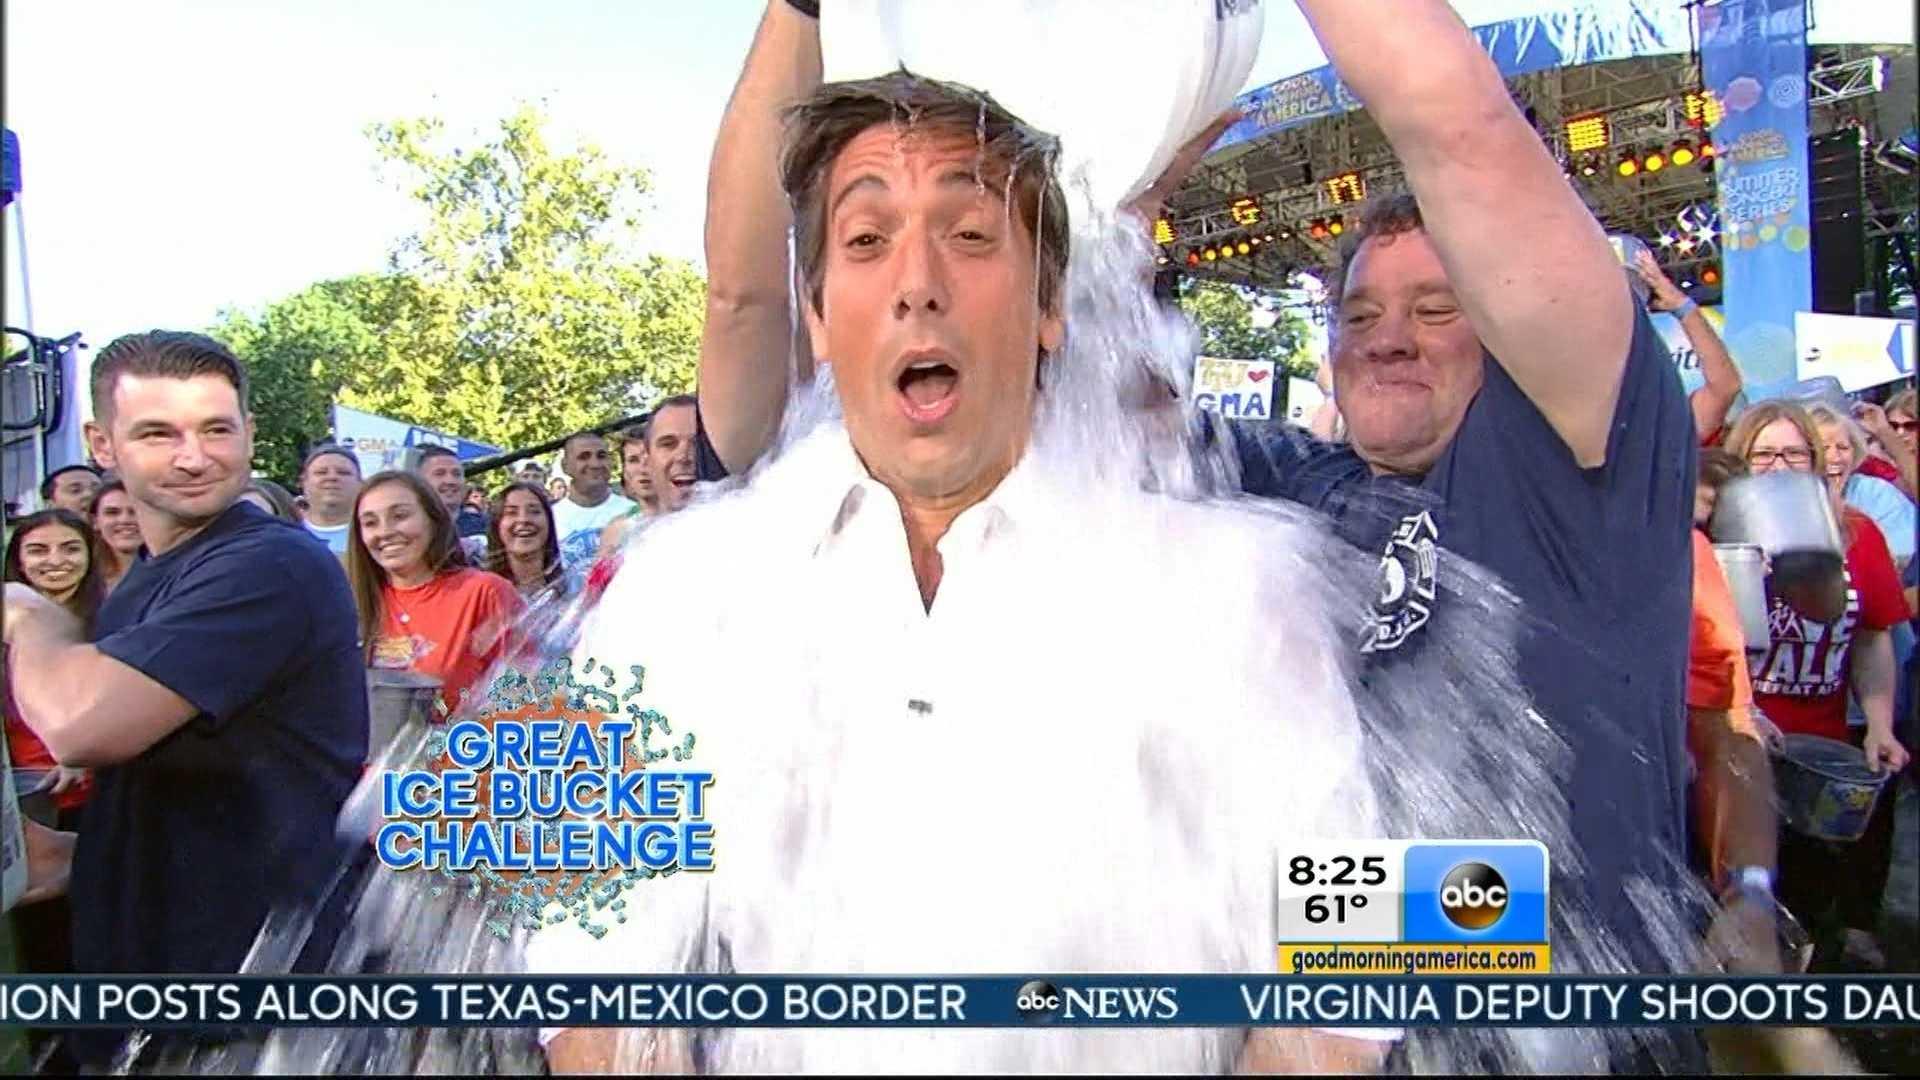 David Muir Ice Bucket Challenge 0815.jpg